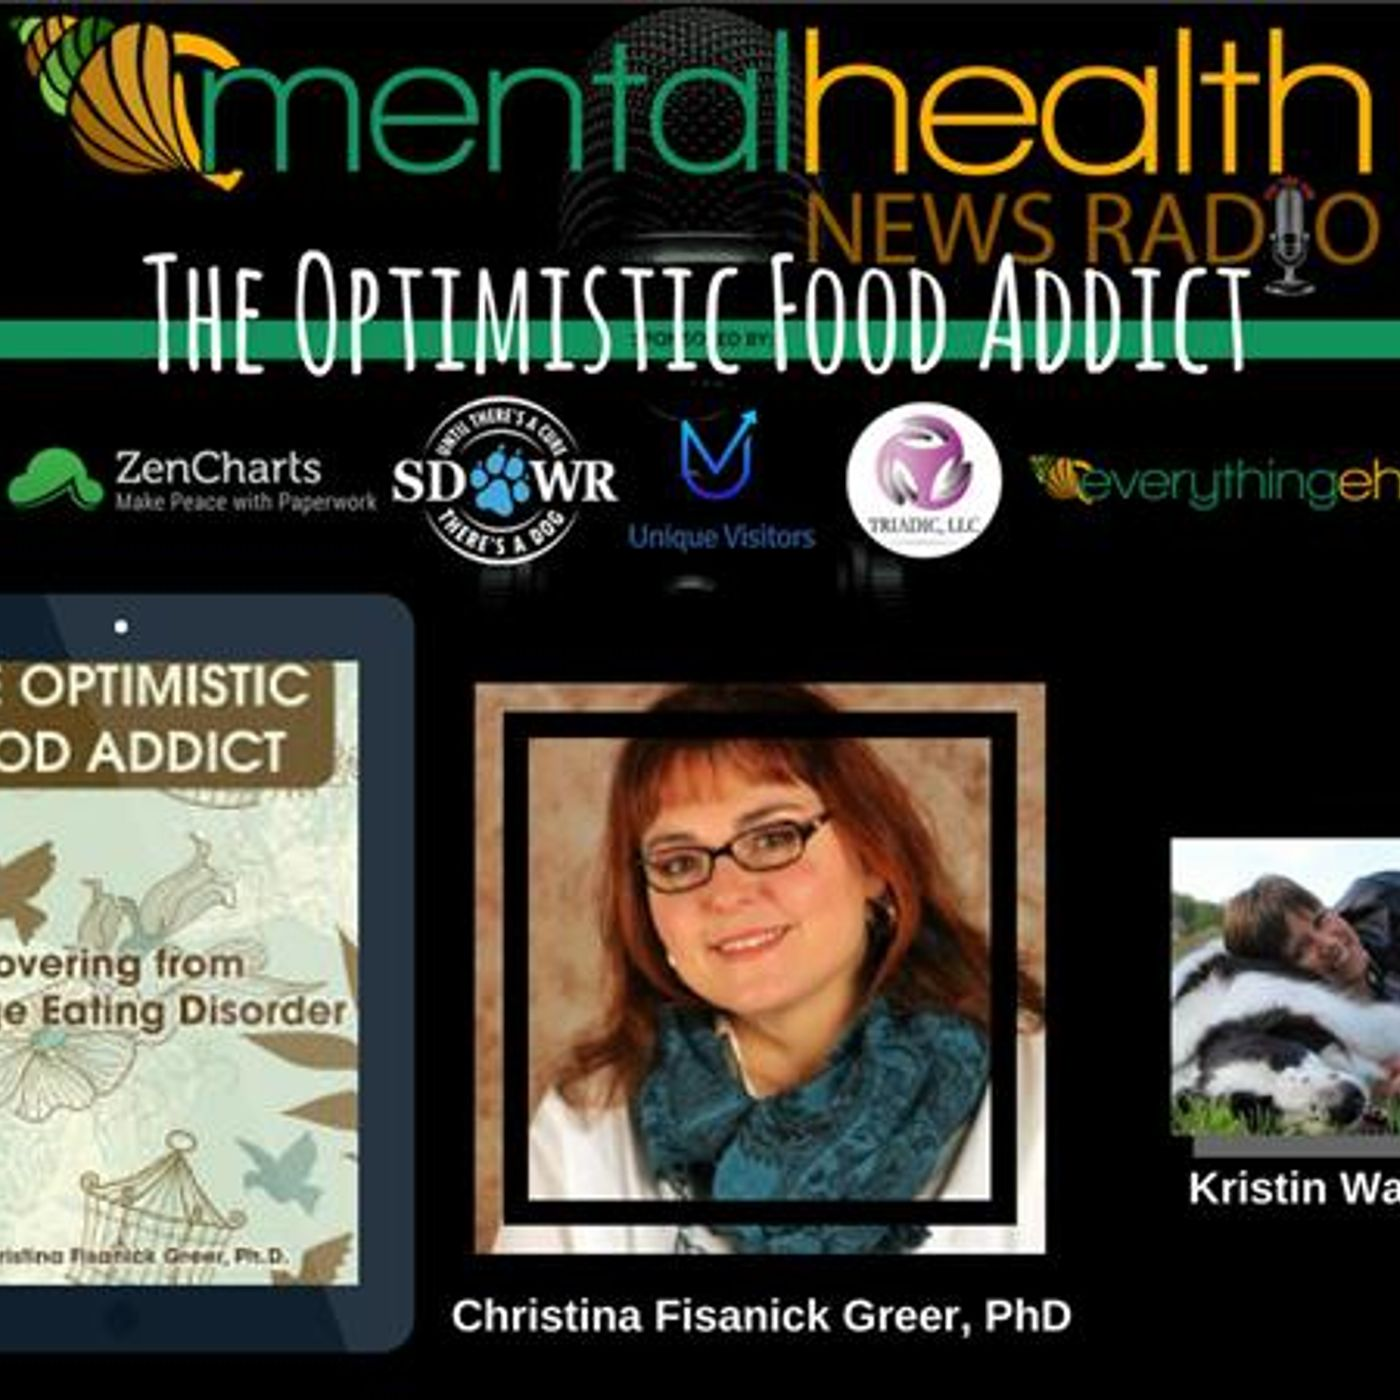 Mental Health News Radio - The Optimistic Food Addict - with Christina Fisanick Greer, Ph.D.